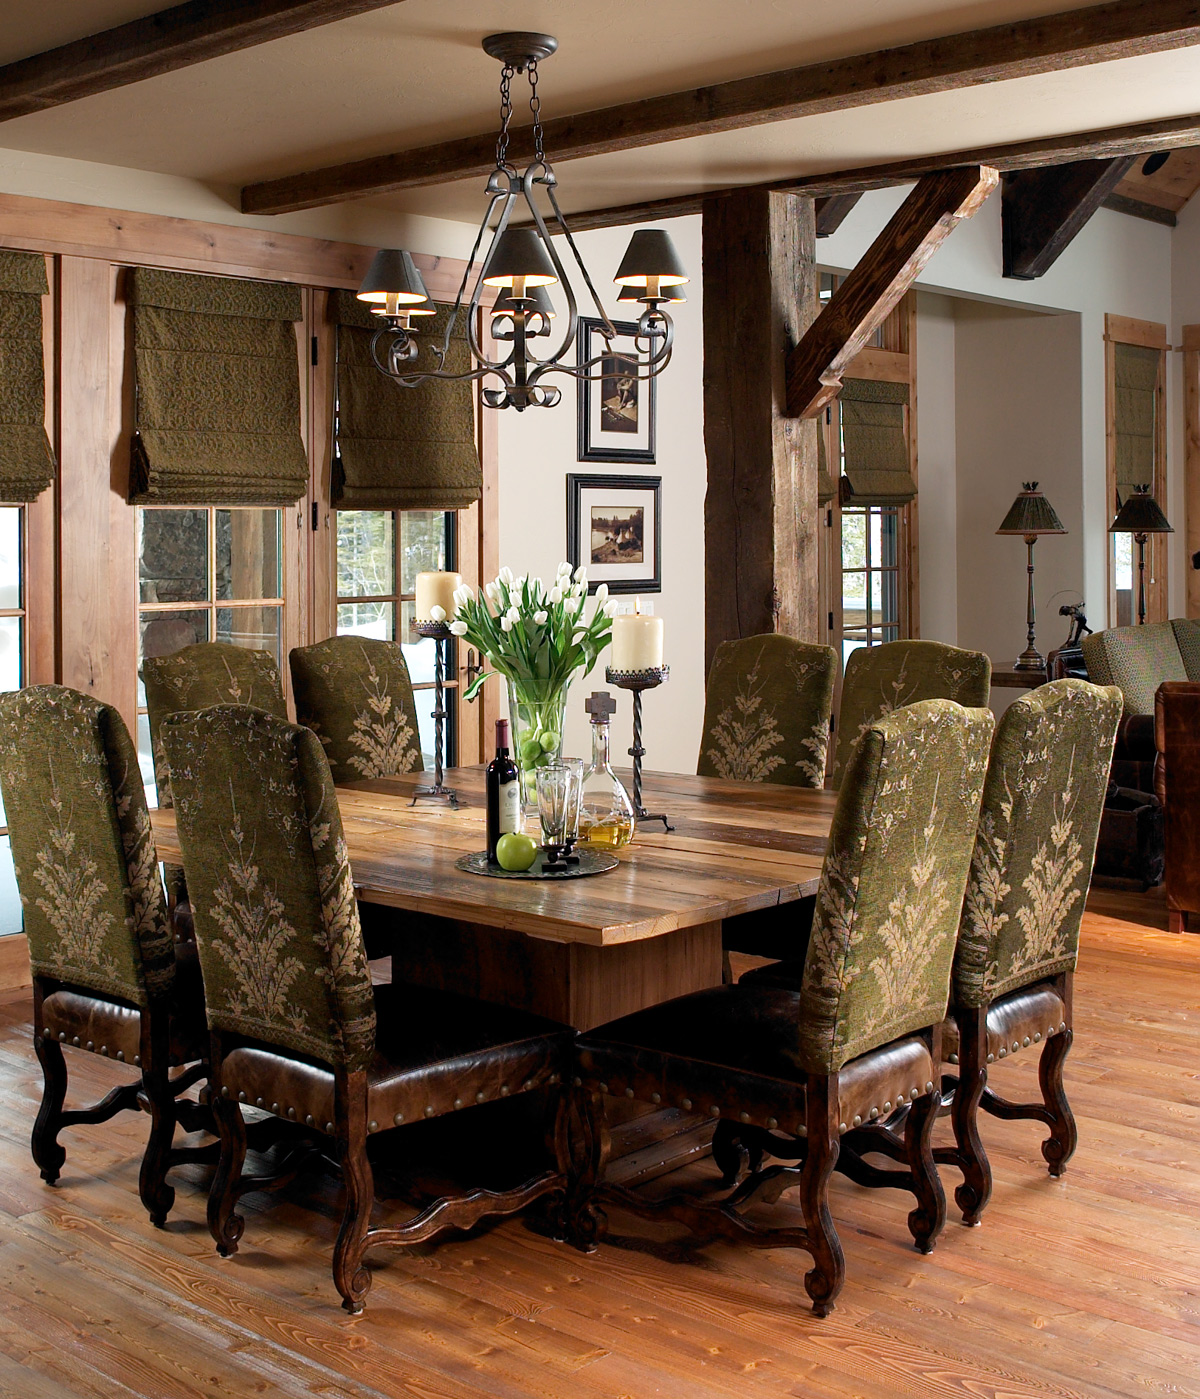 Fullsize Of Rustic Homes Interiors